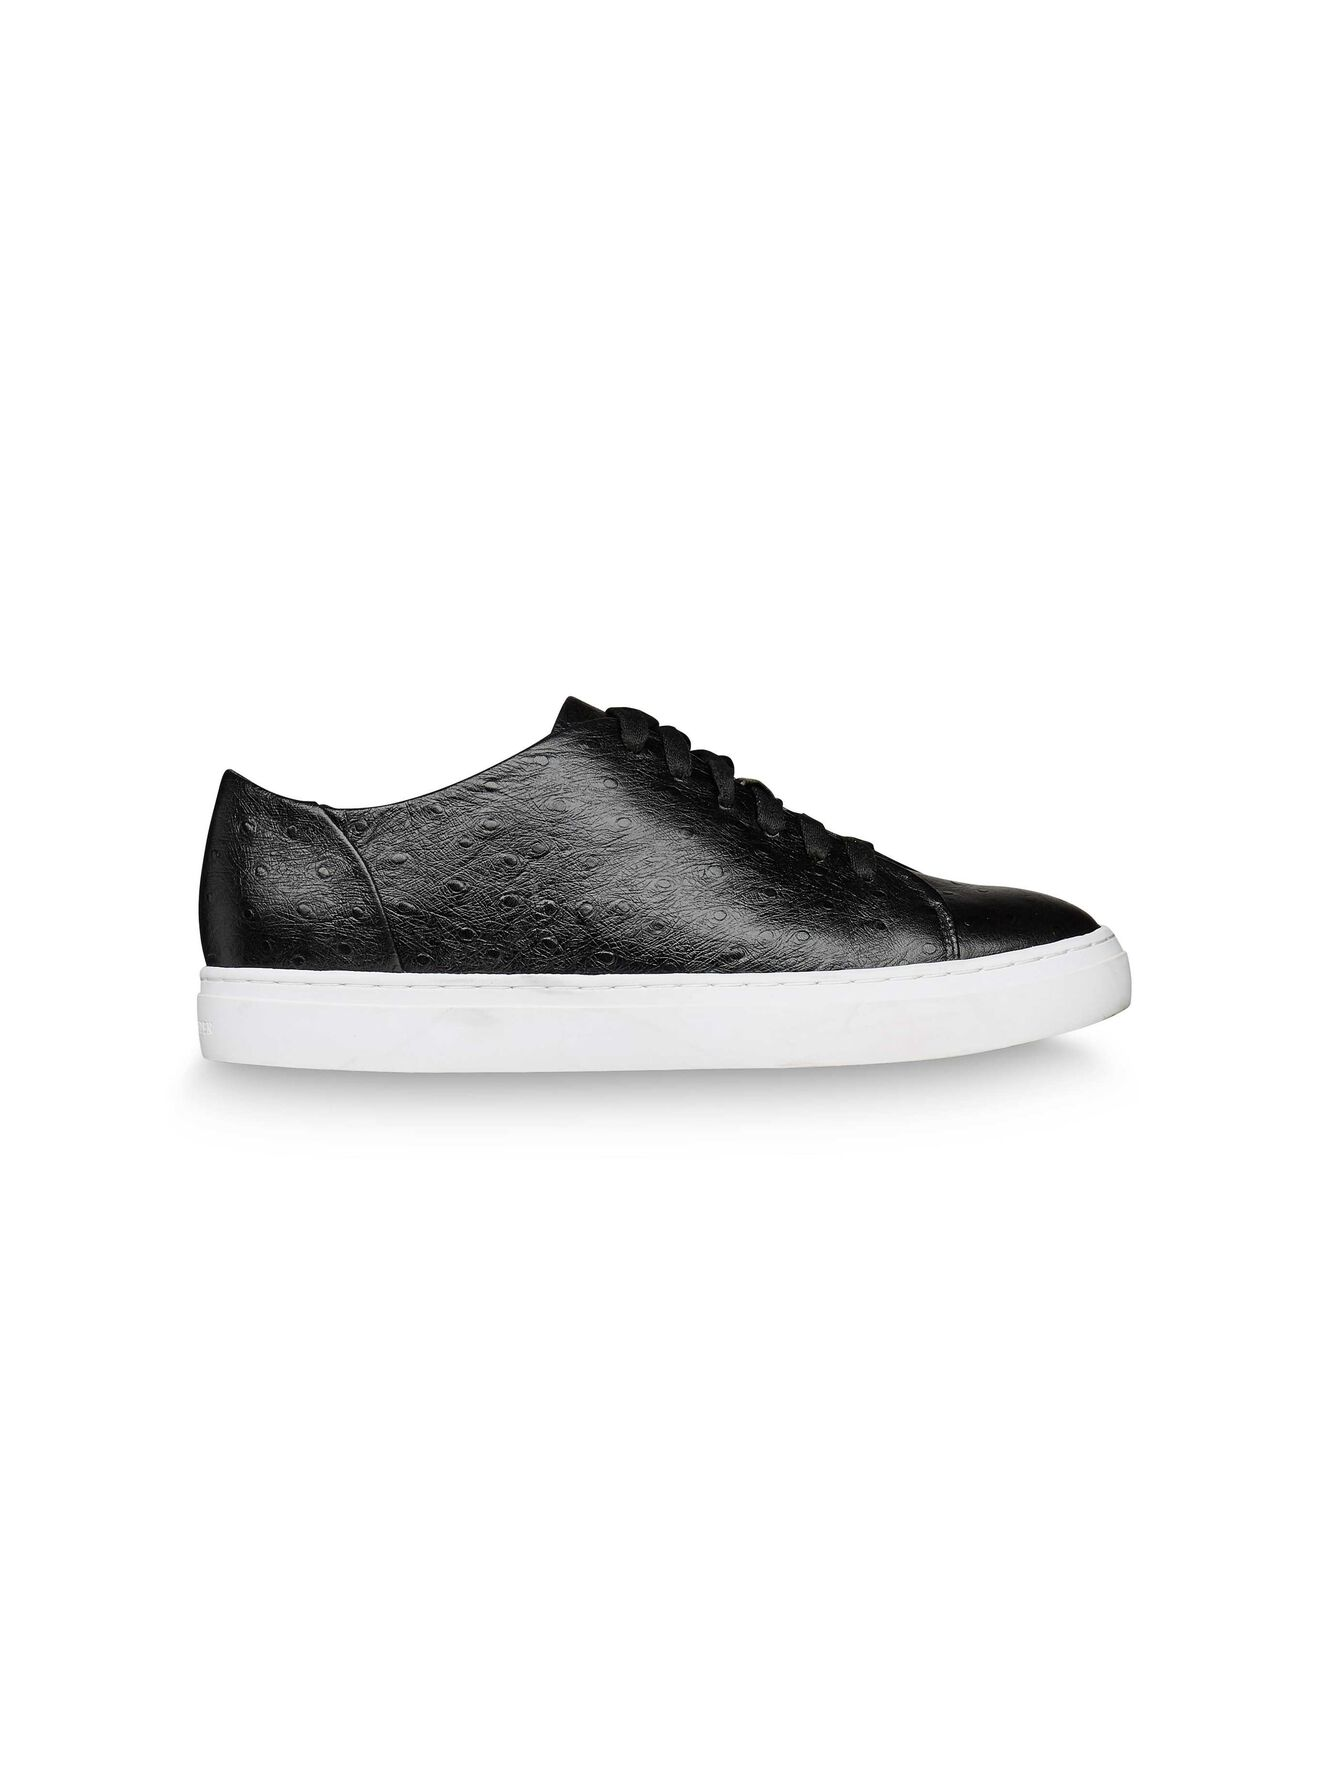 Crewe Sneaker in Black from Tiger of Sweden